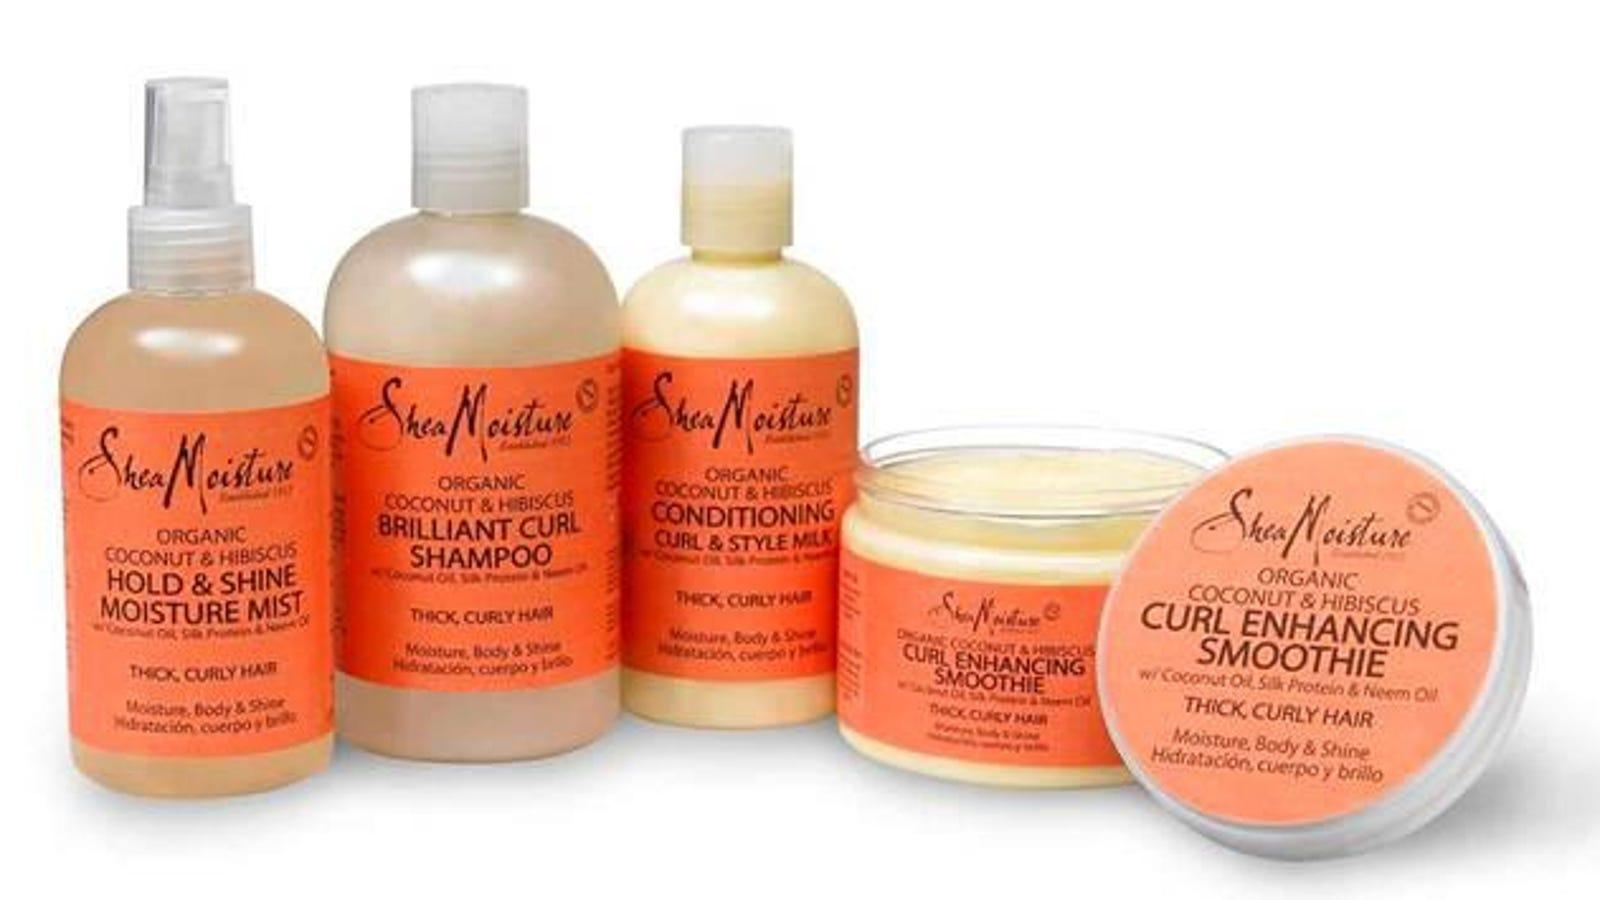 Shea moisture buy one get one free